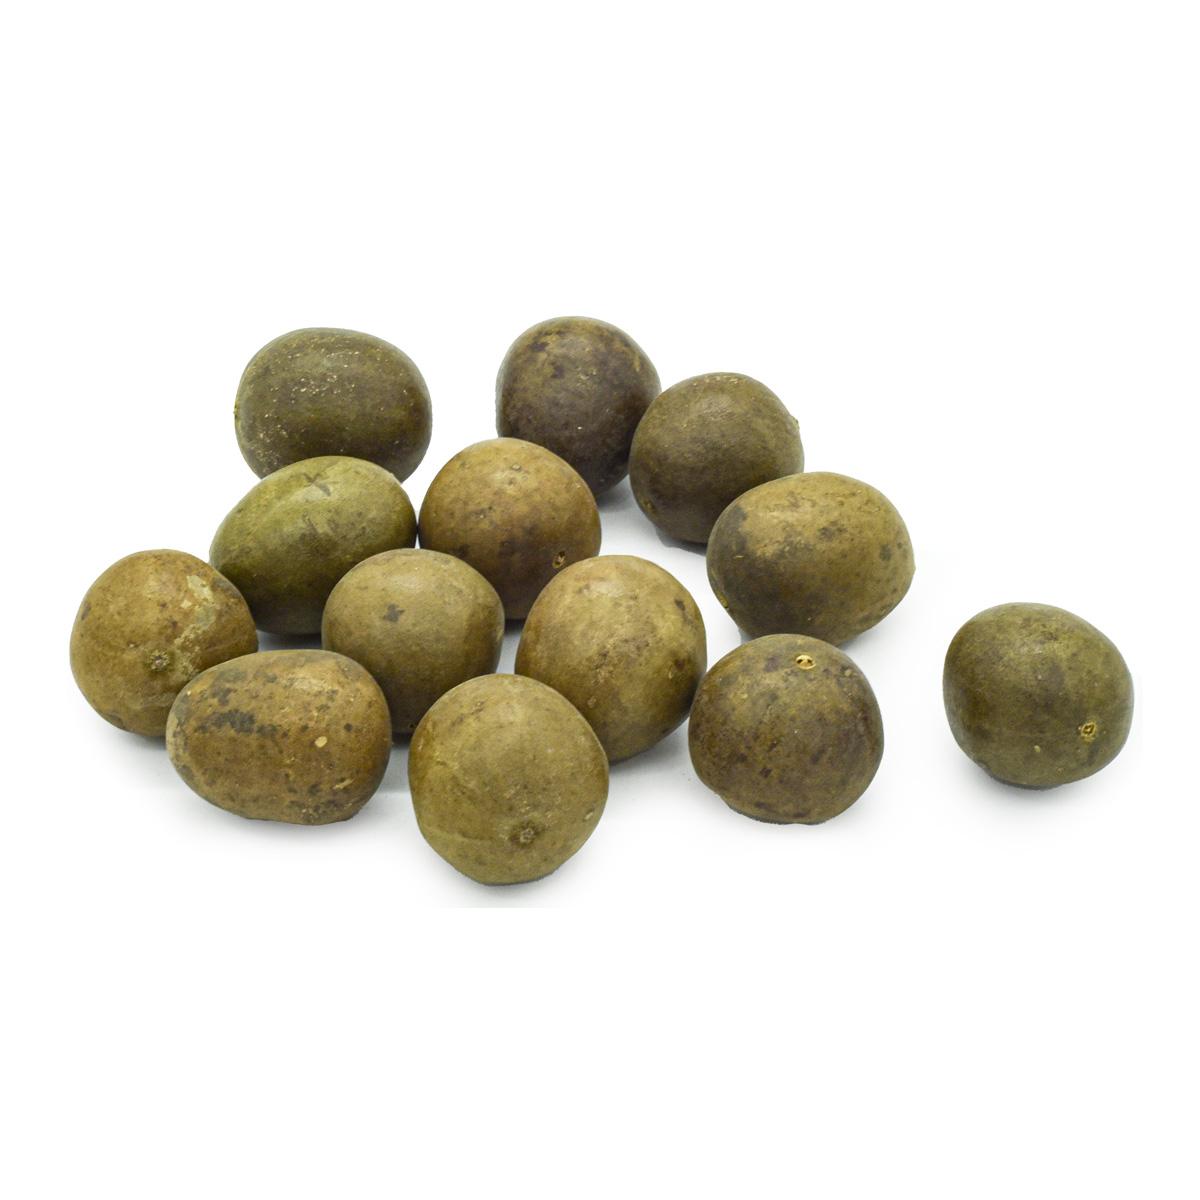 YW244 Декоративные элементы натуральные. Плод Архата, 4см, 100гр